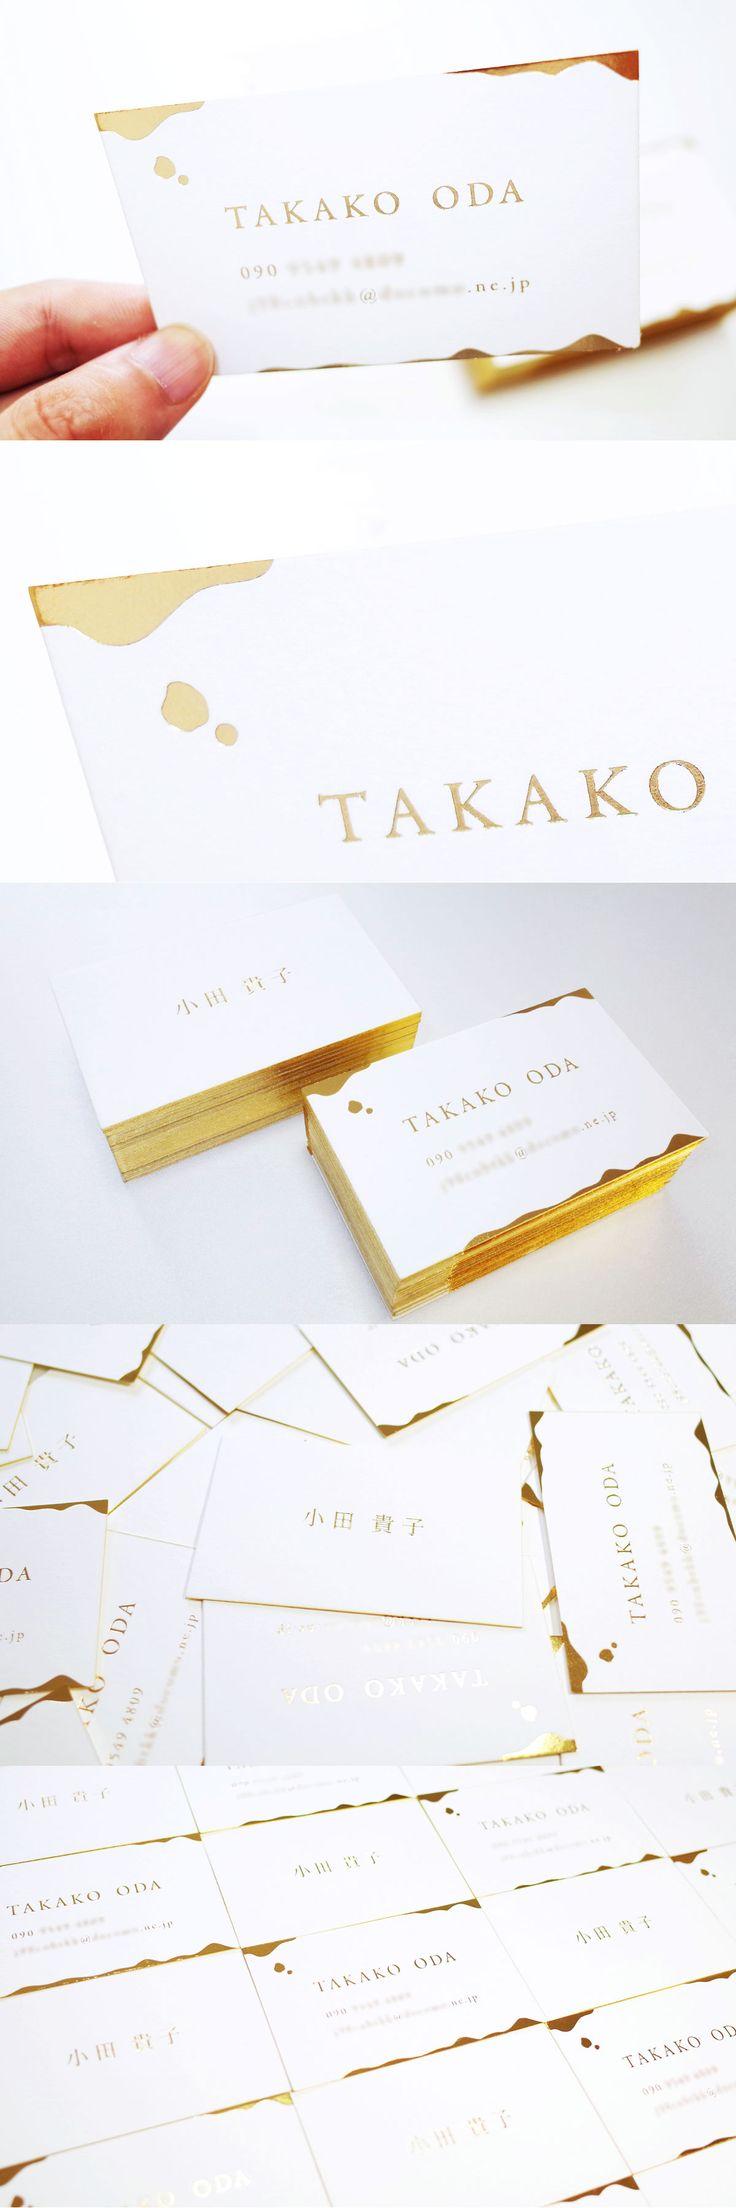 Gold business card design   金箔名刺デザイン #businesscard #card #print #design #gold  #idea #creative #inspiration #名刺 #カード #デザイン #おしゃれ #アイデア